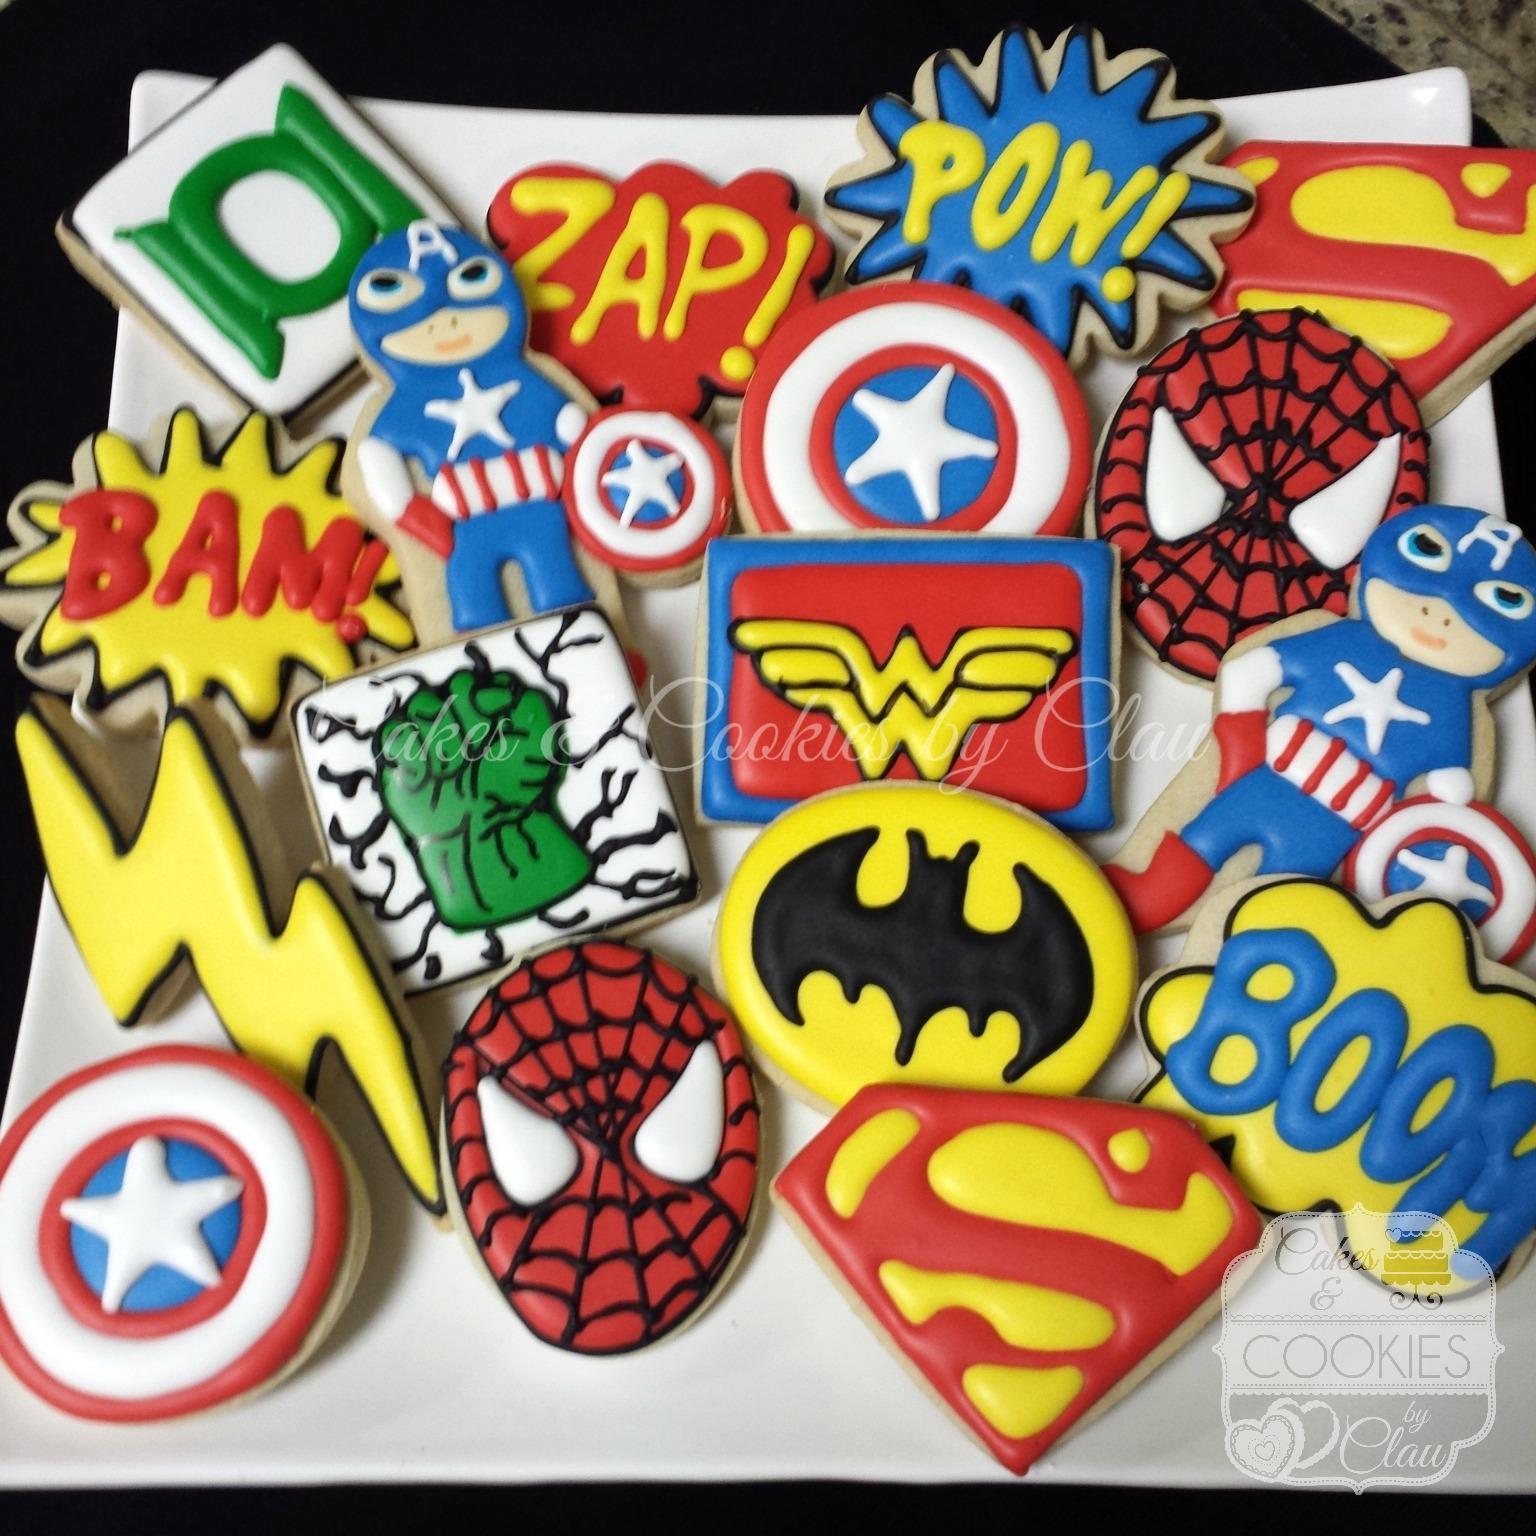 Superheroes - Drew